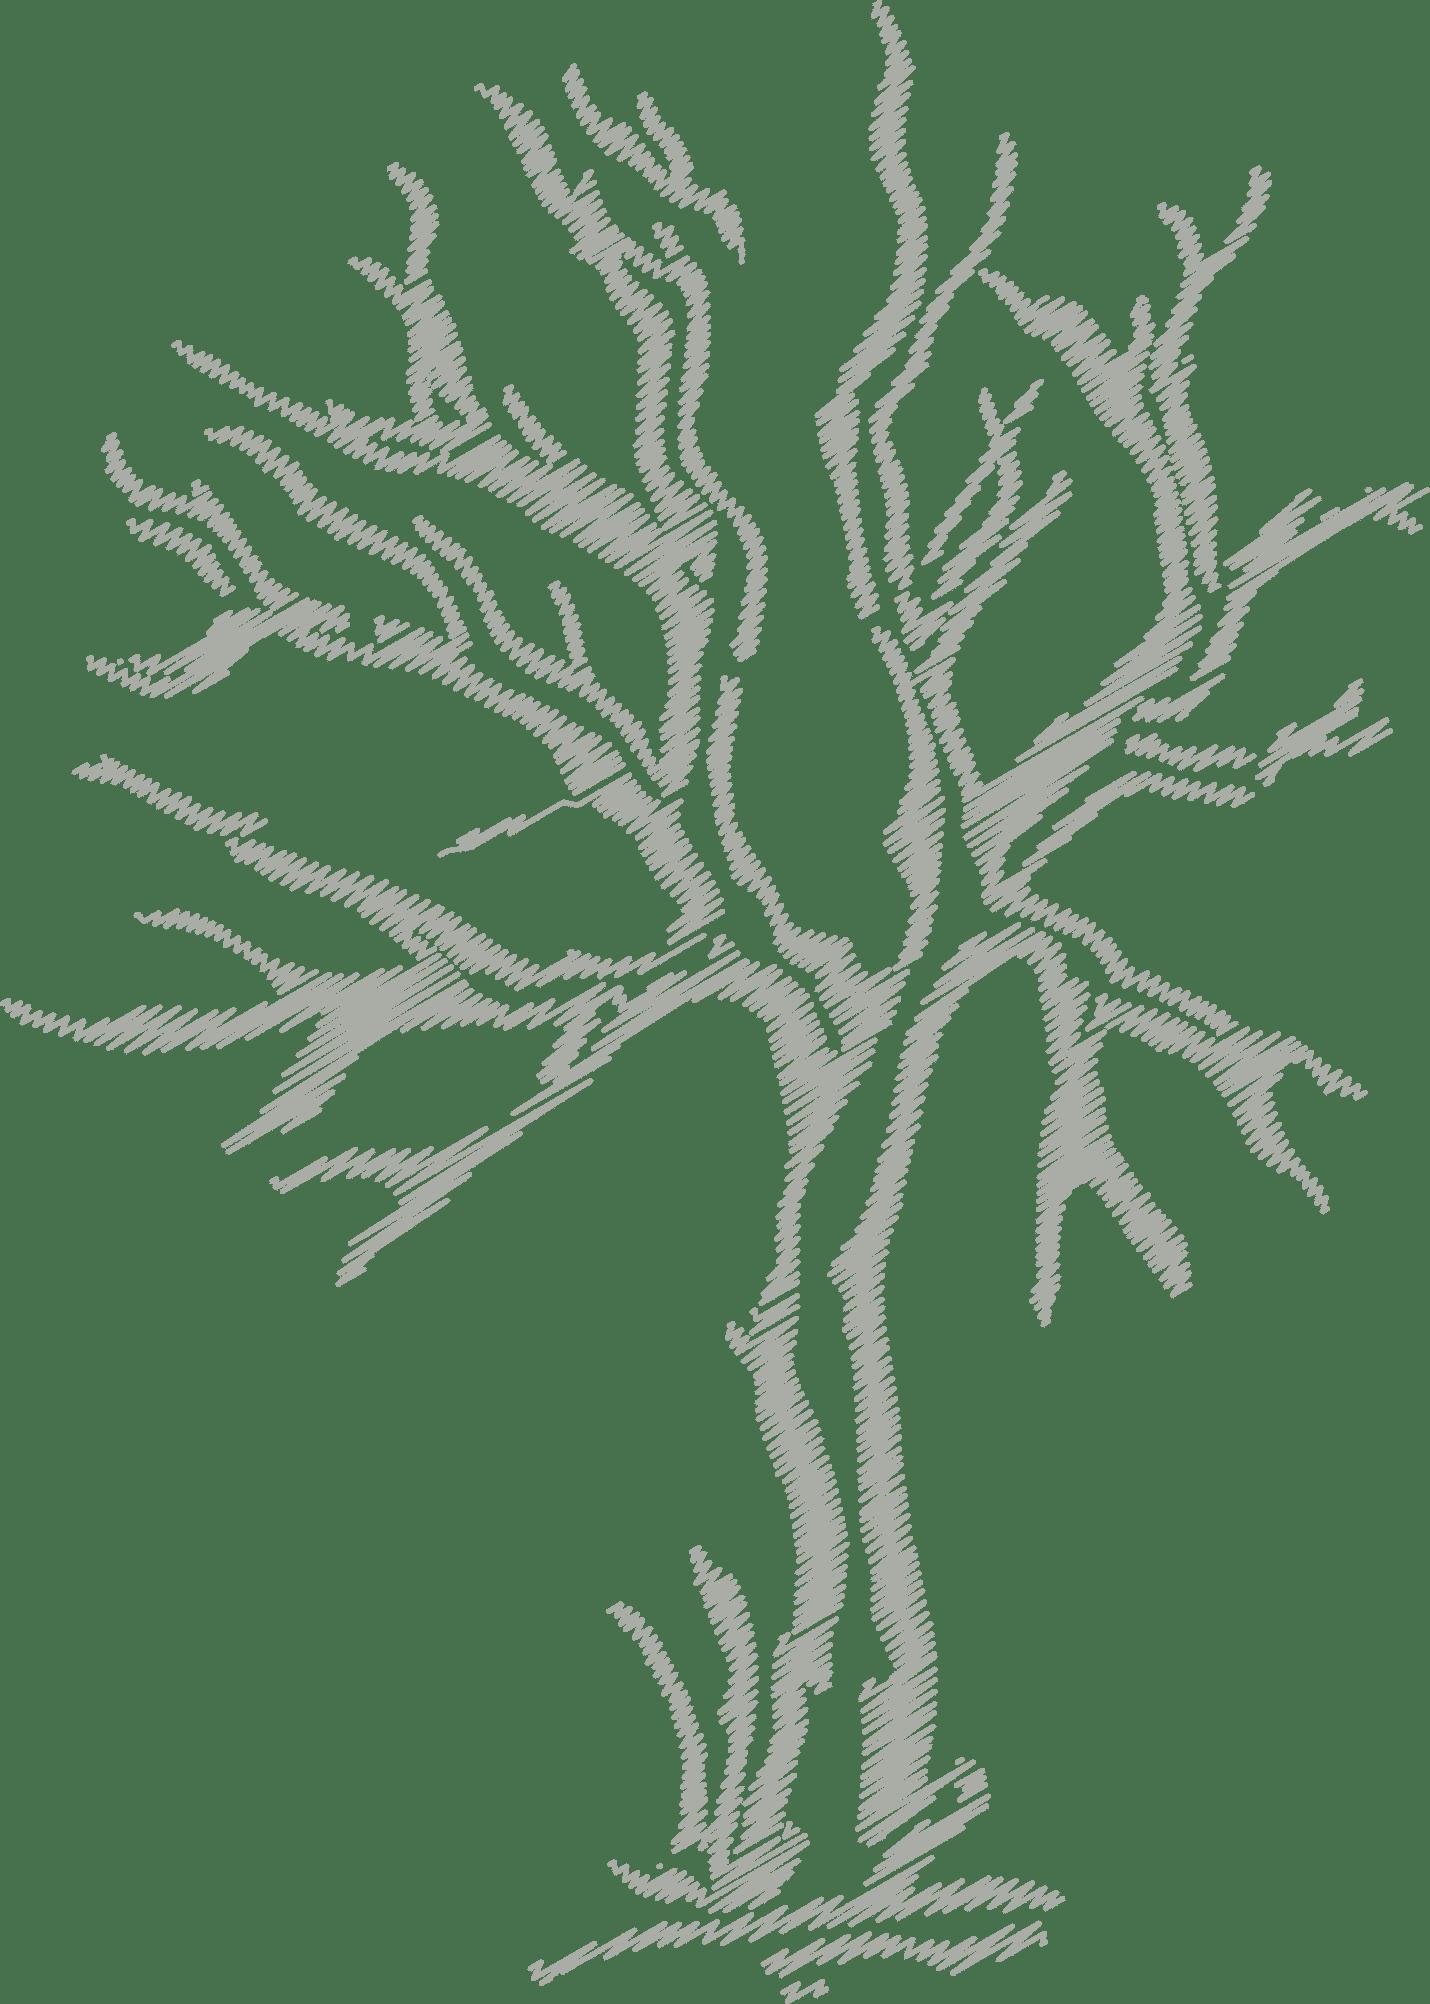 Levensboom Thanatopraxie Rens de Peijper